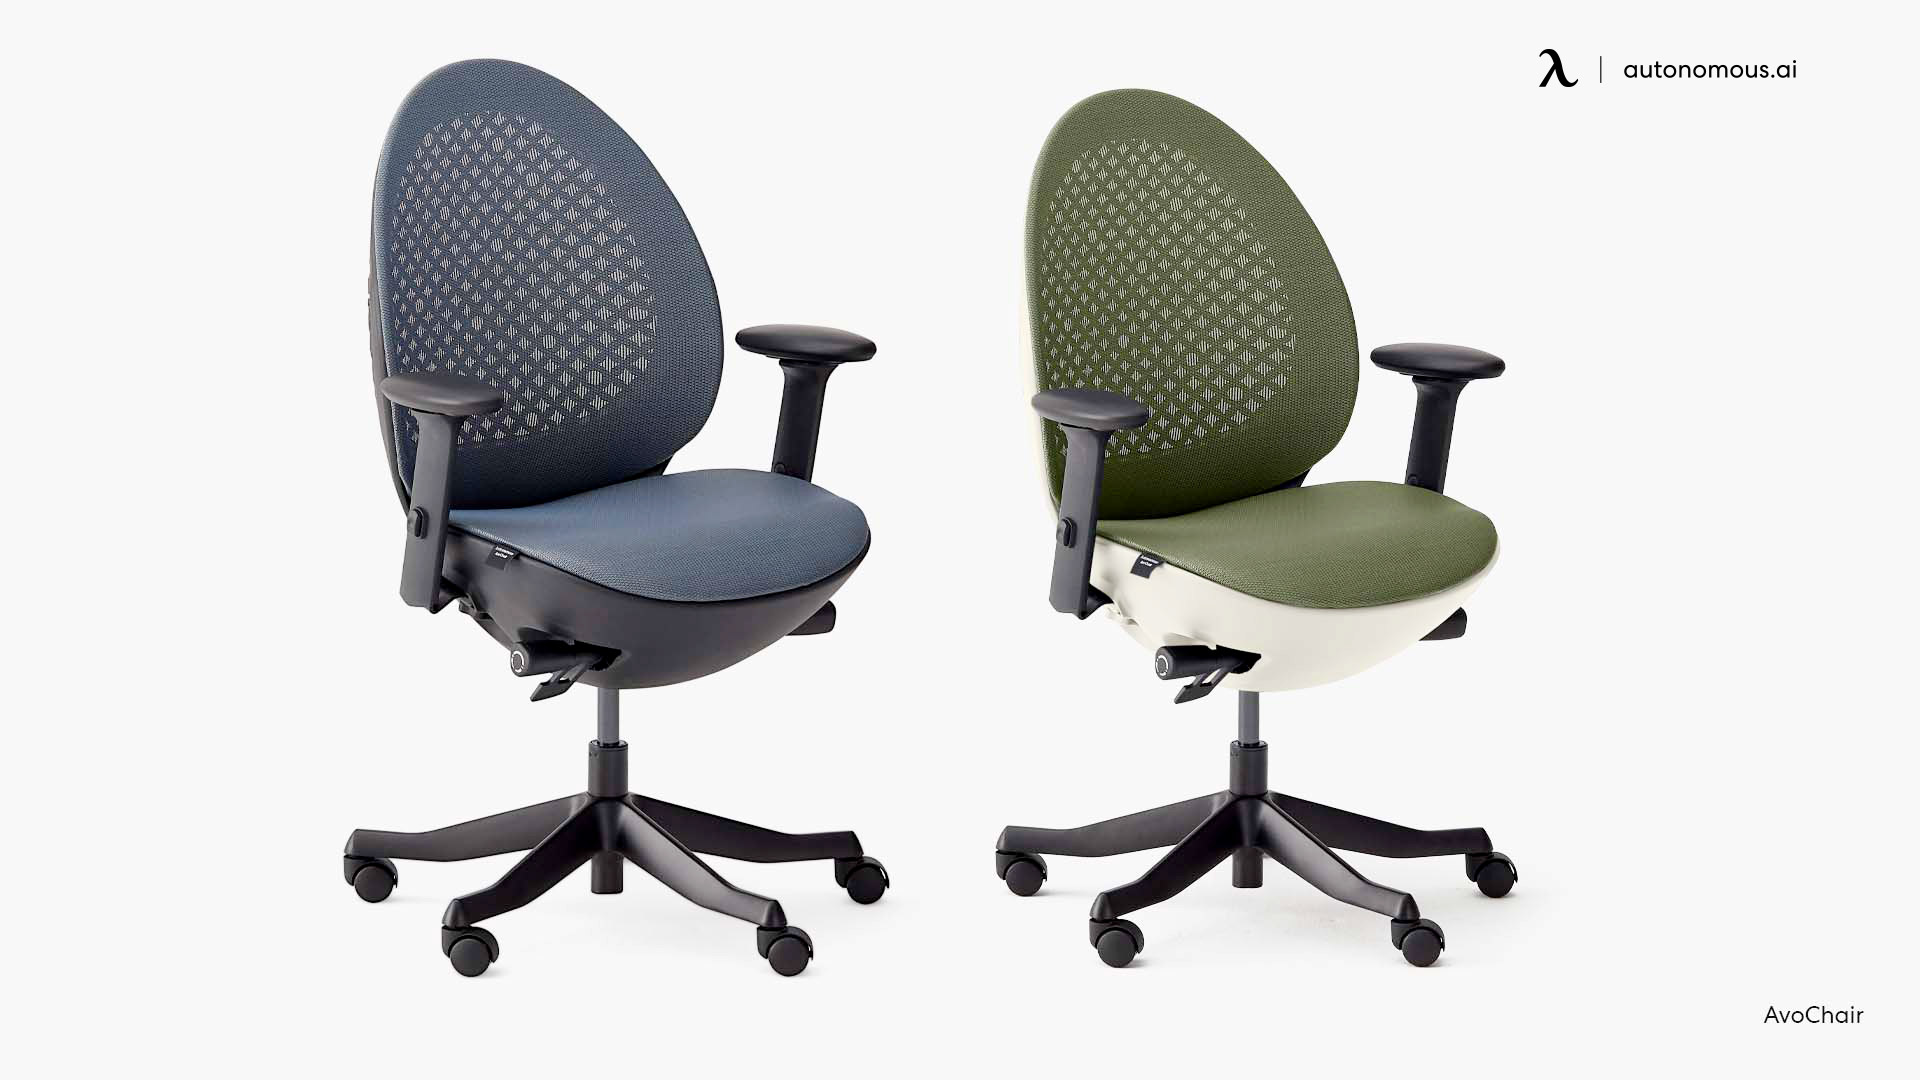 AvoChair as office chair design